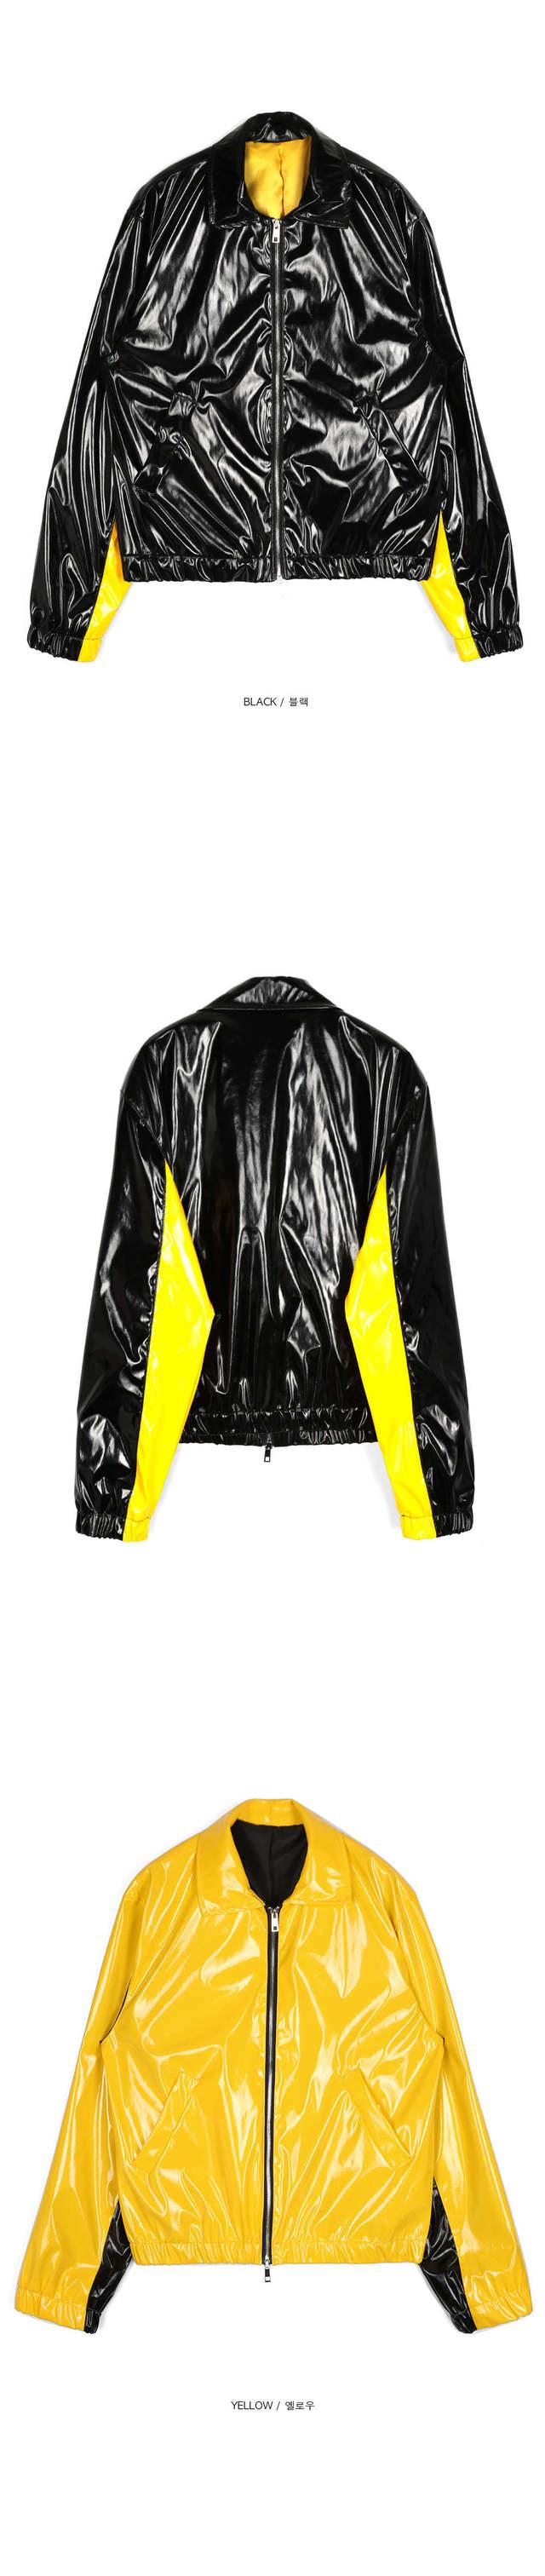 SALE pointed line enamel jacket - UNISEX